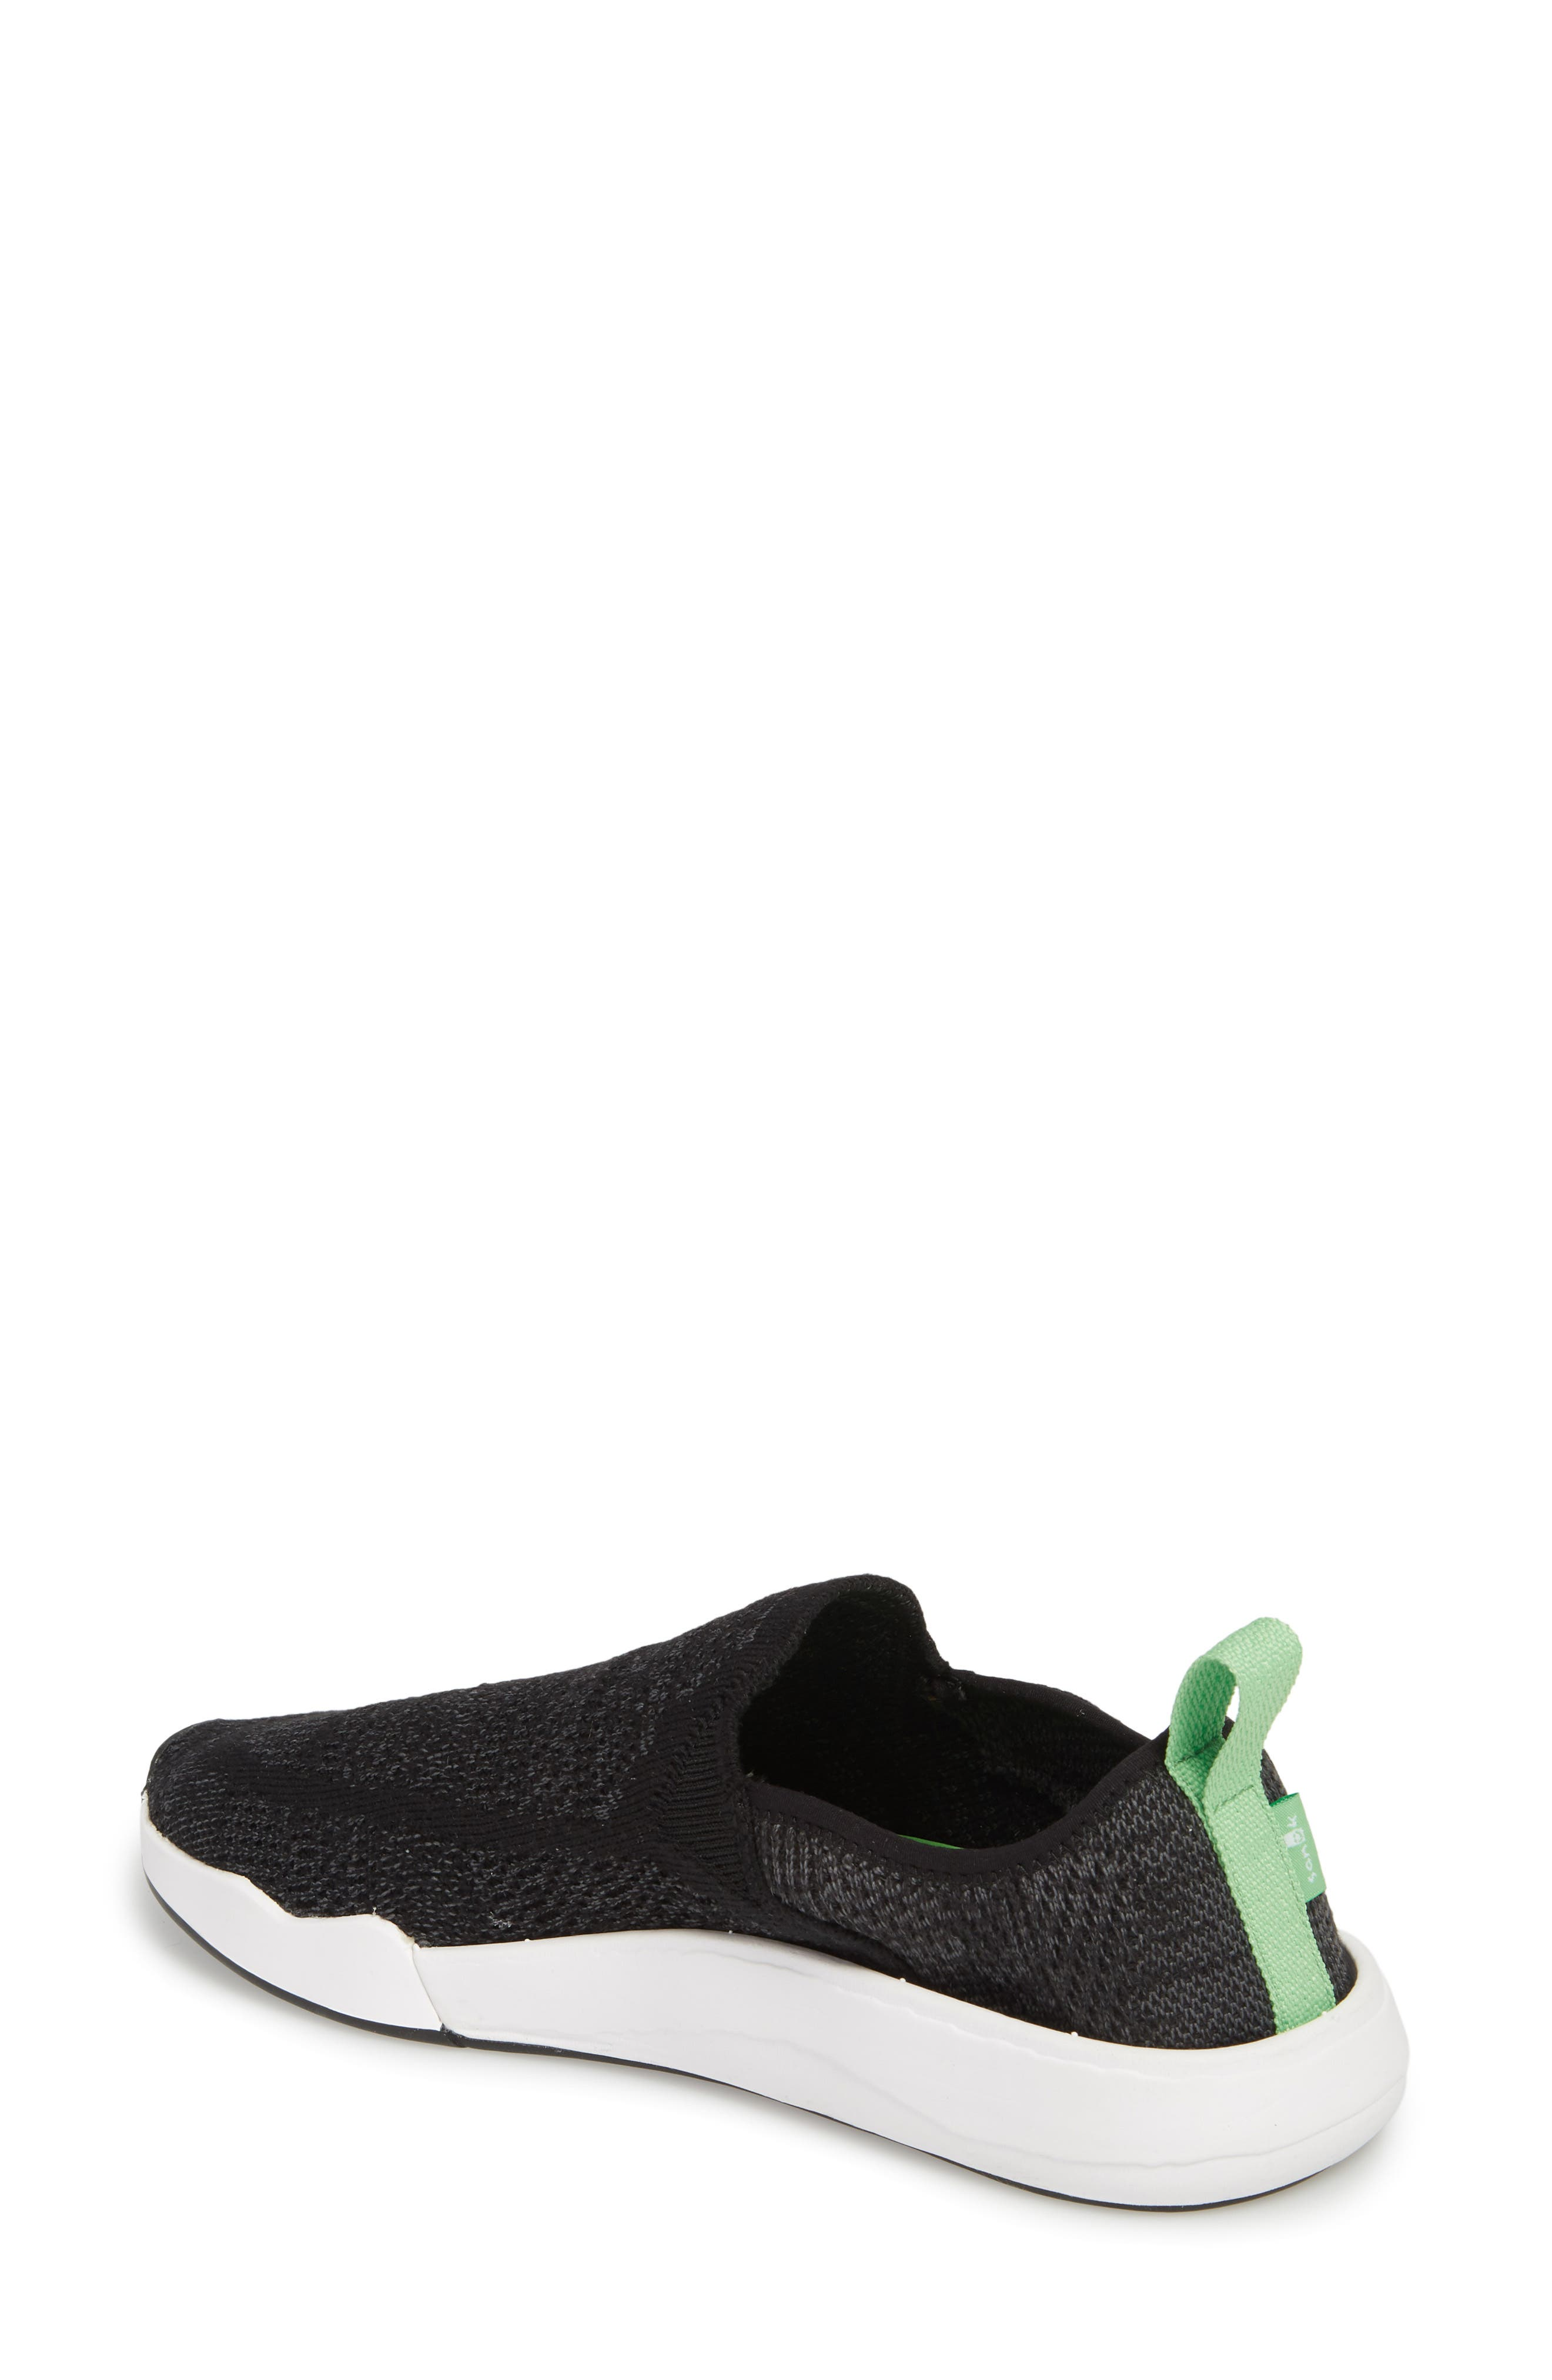 Chiba Quest Knit Slip-On Sneaker,                             Alternate thumbnail 2, color,                             Black